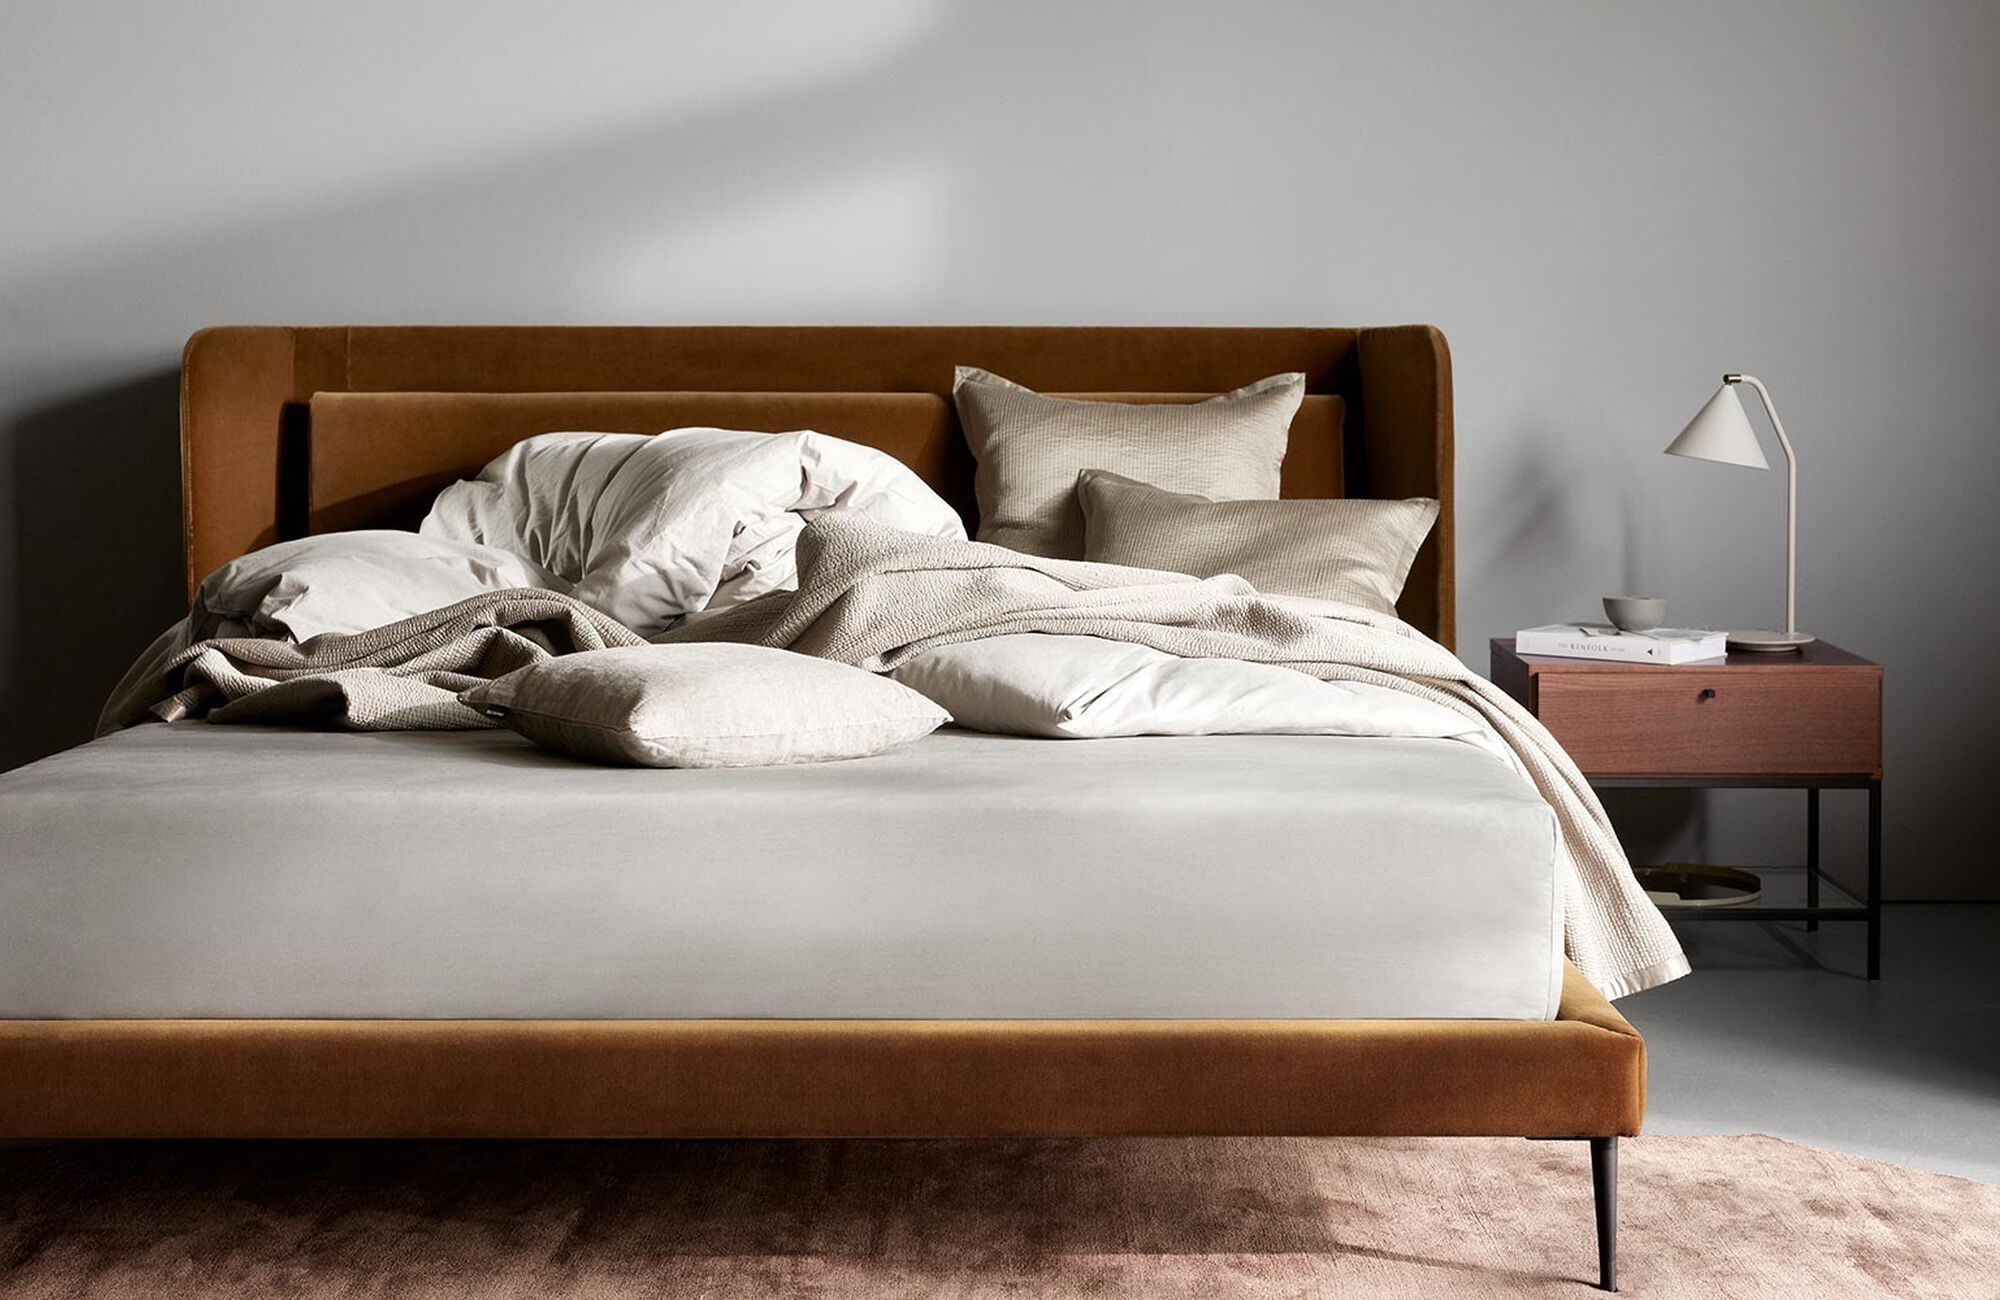 Colchones - Colchón Comfort Híbrido firme/extra firme